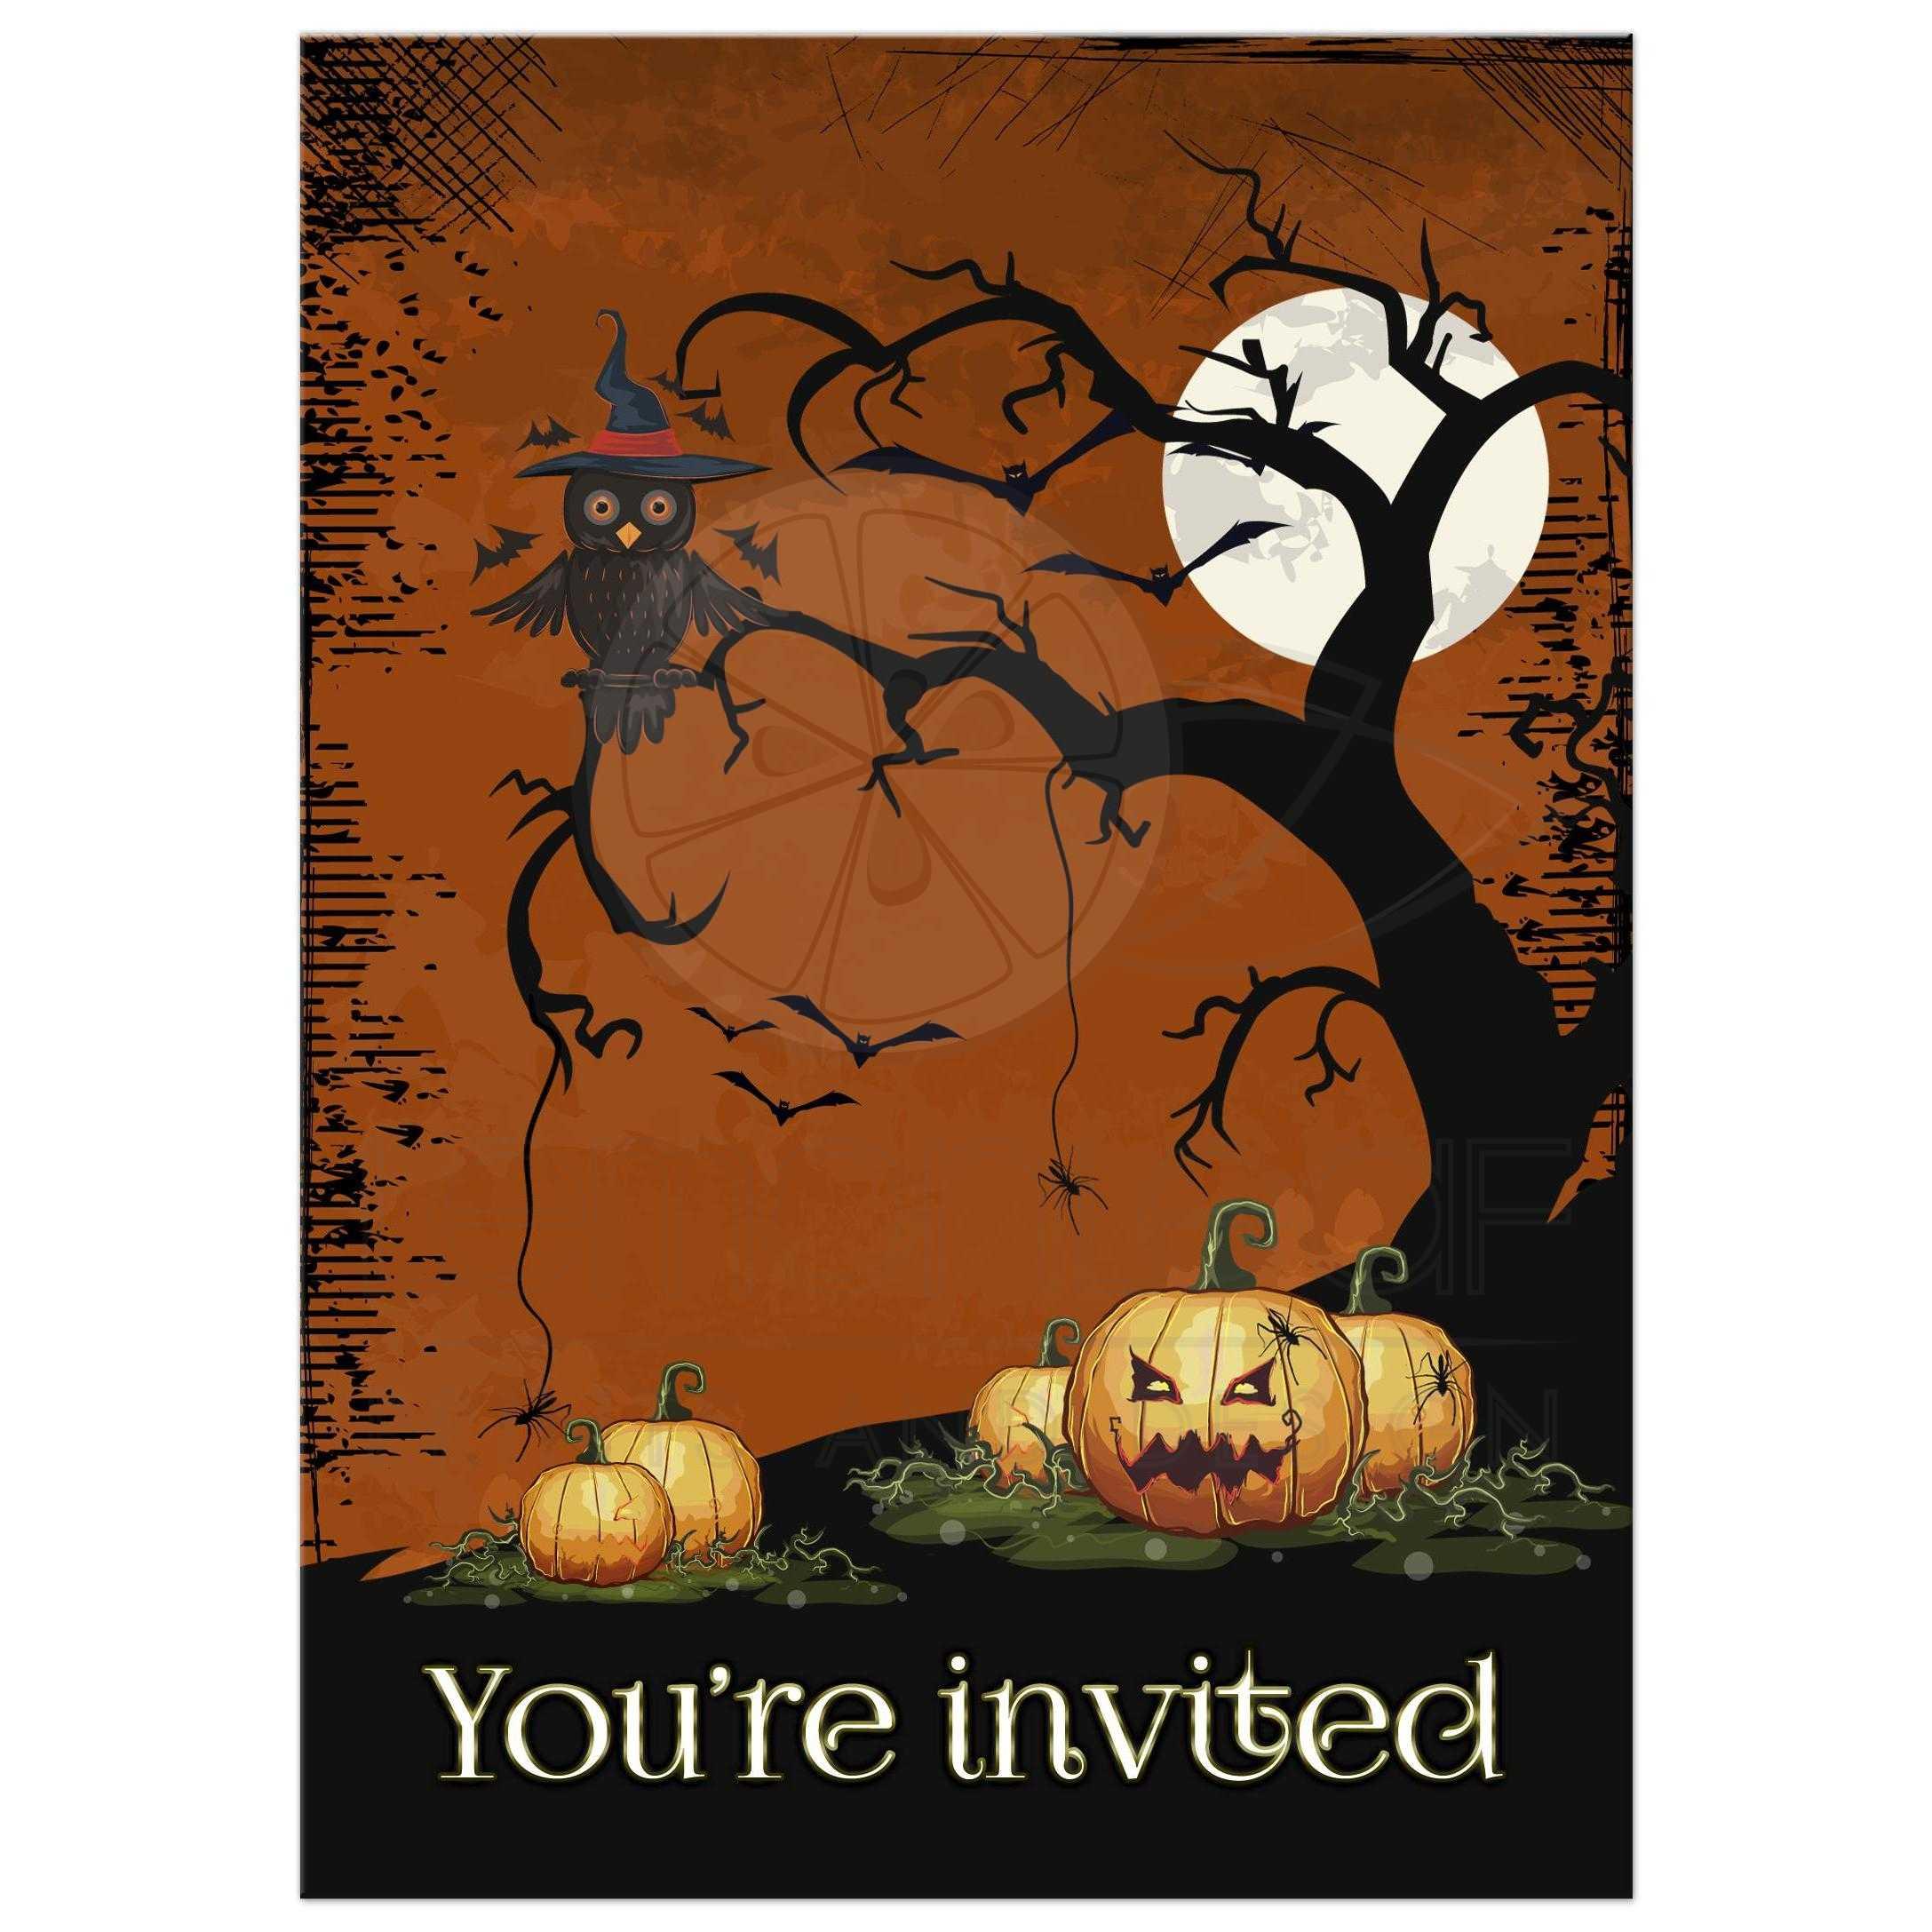 halloween party invatation